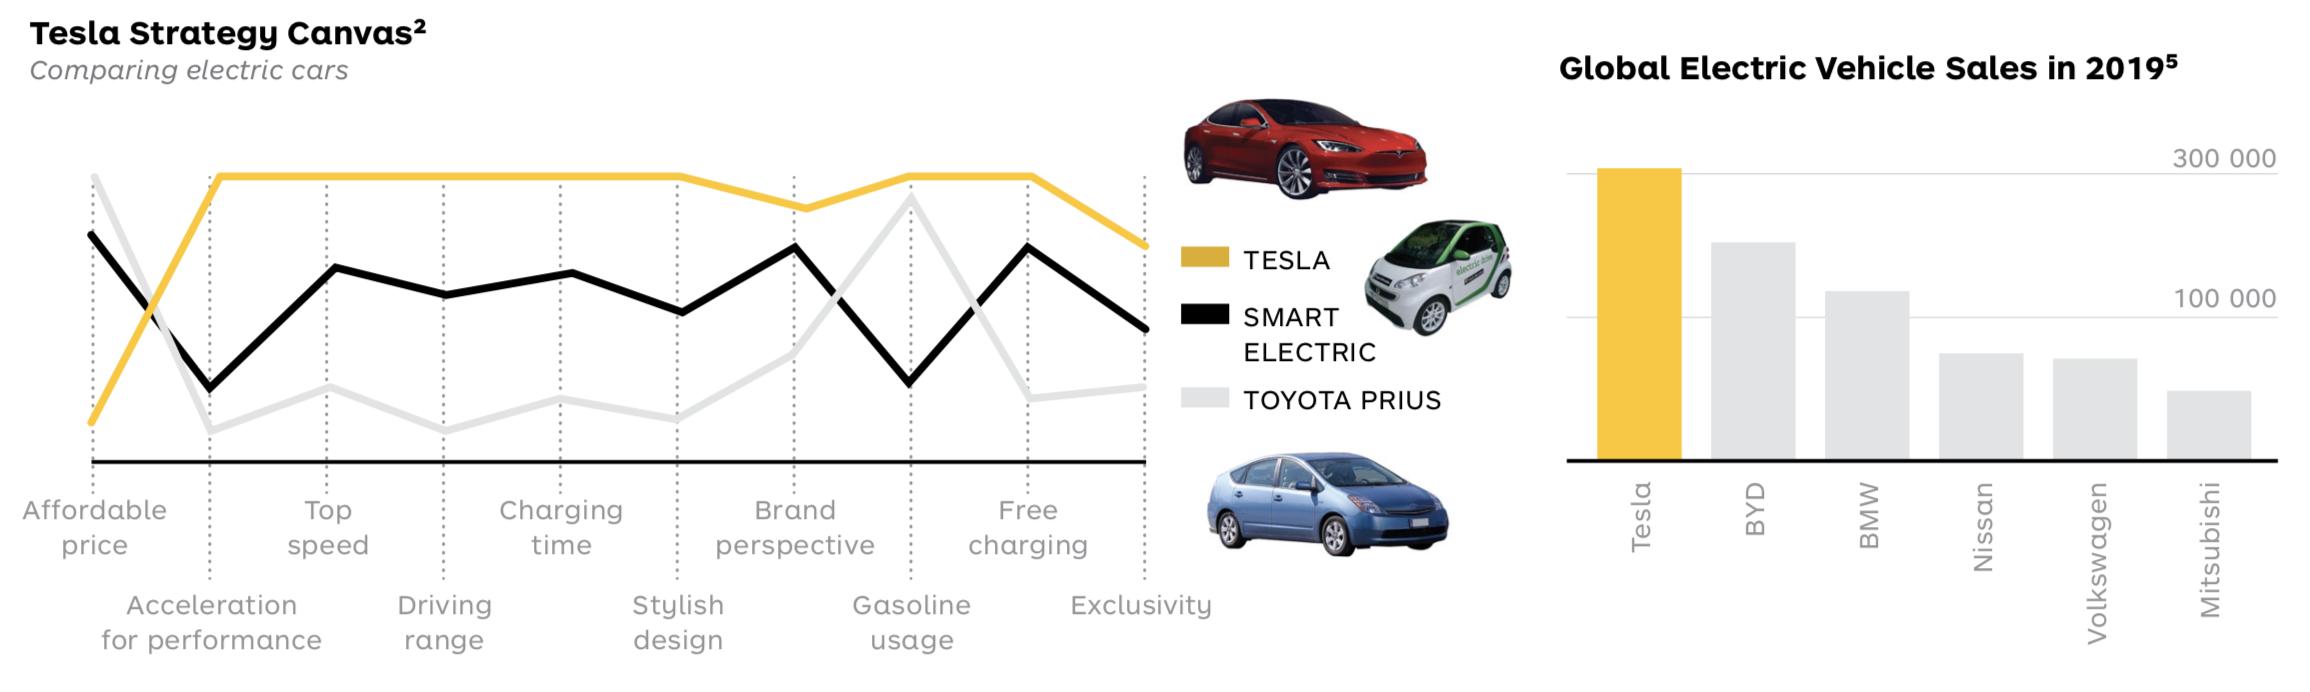 Tesla Fun Facts 2